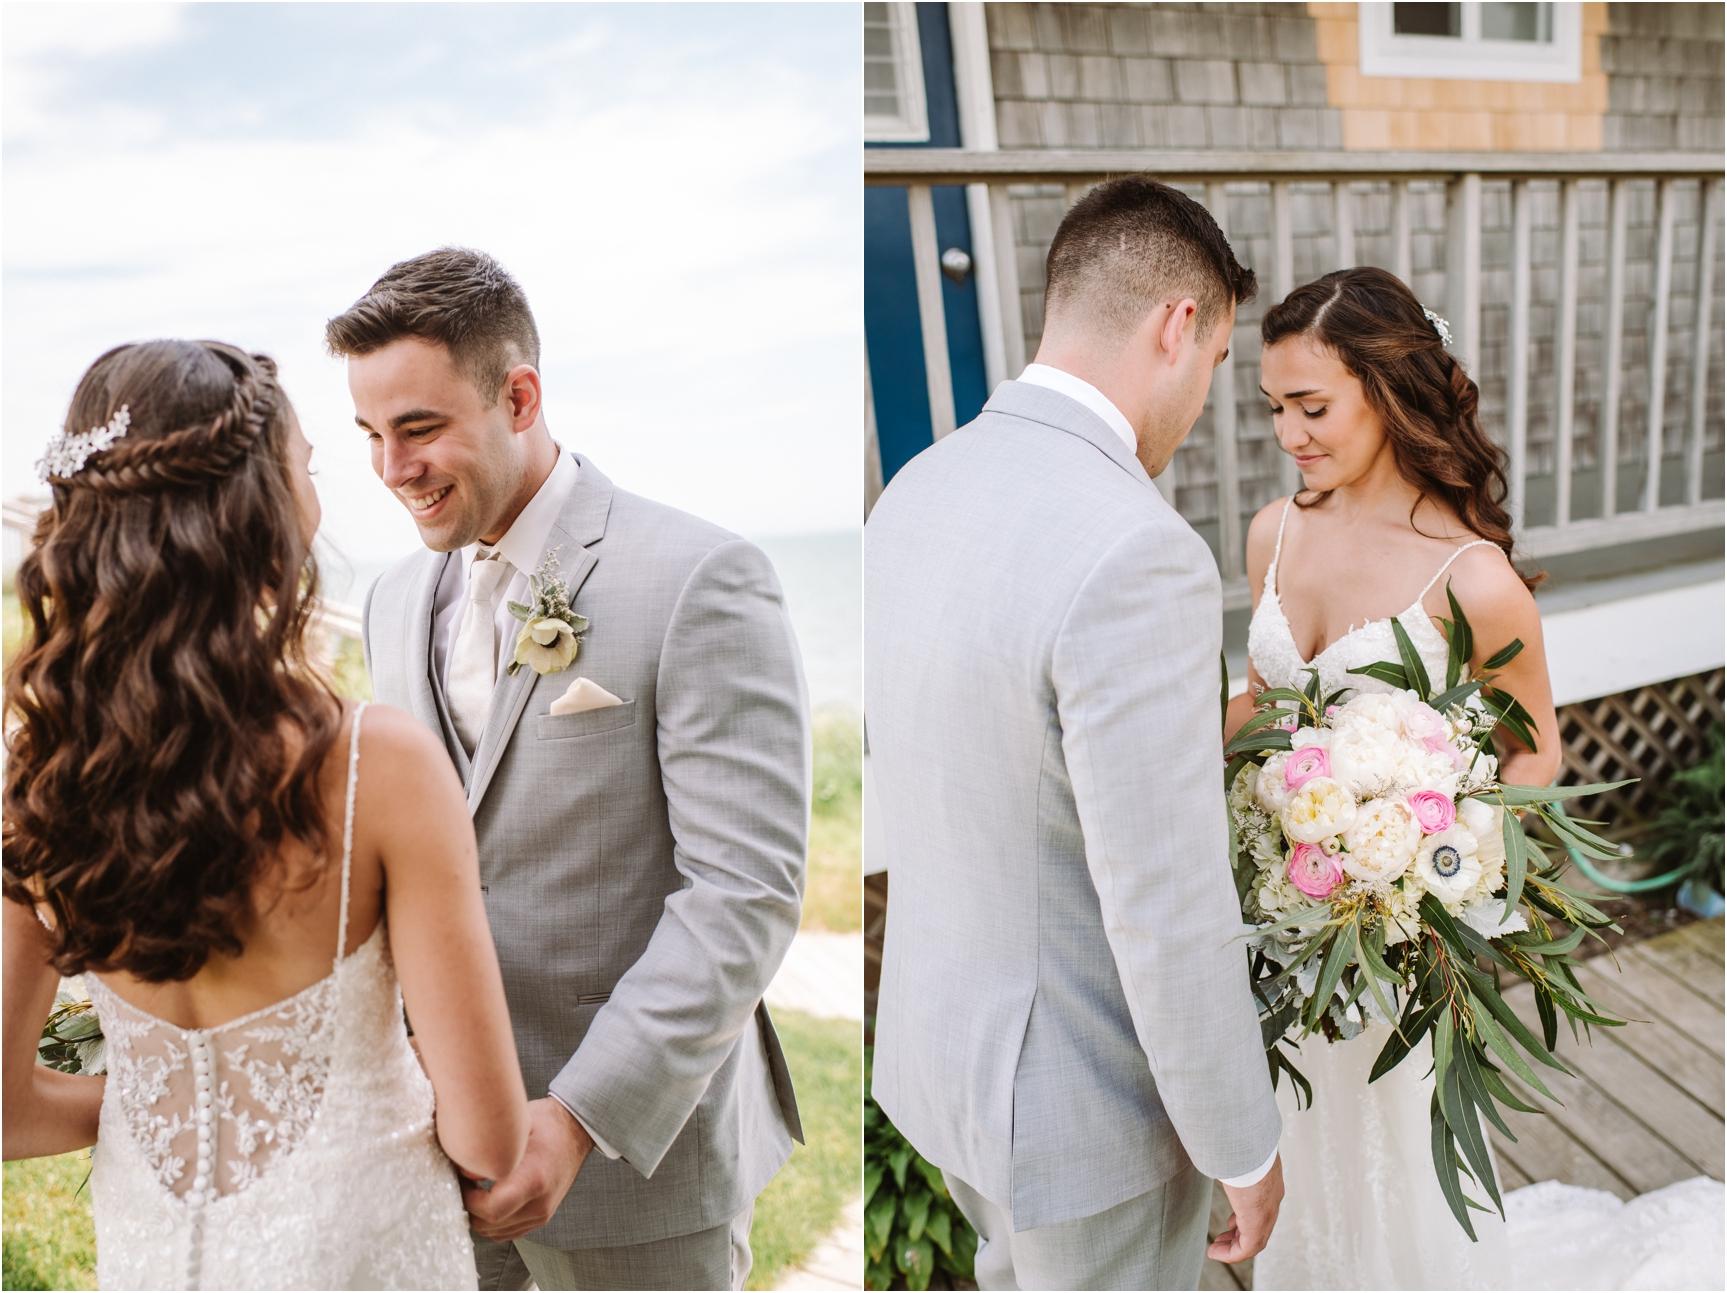 Sarah & Sam Pelham House Cape Cod Wedding Photographer-40.jpg